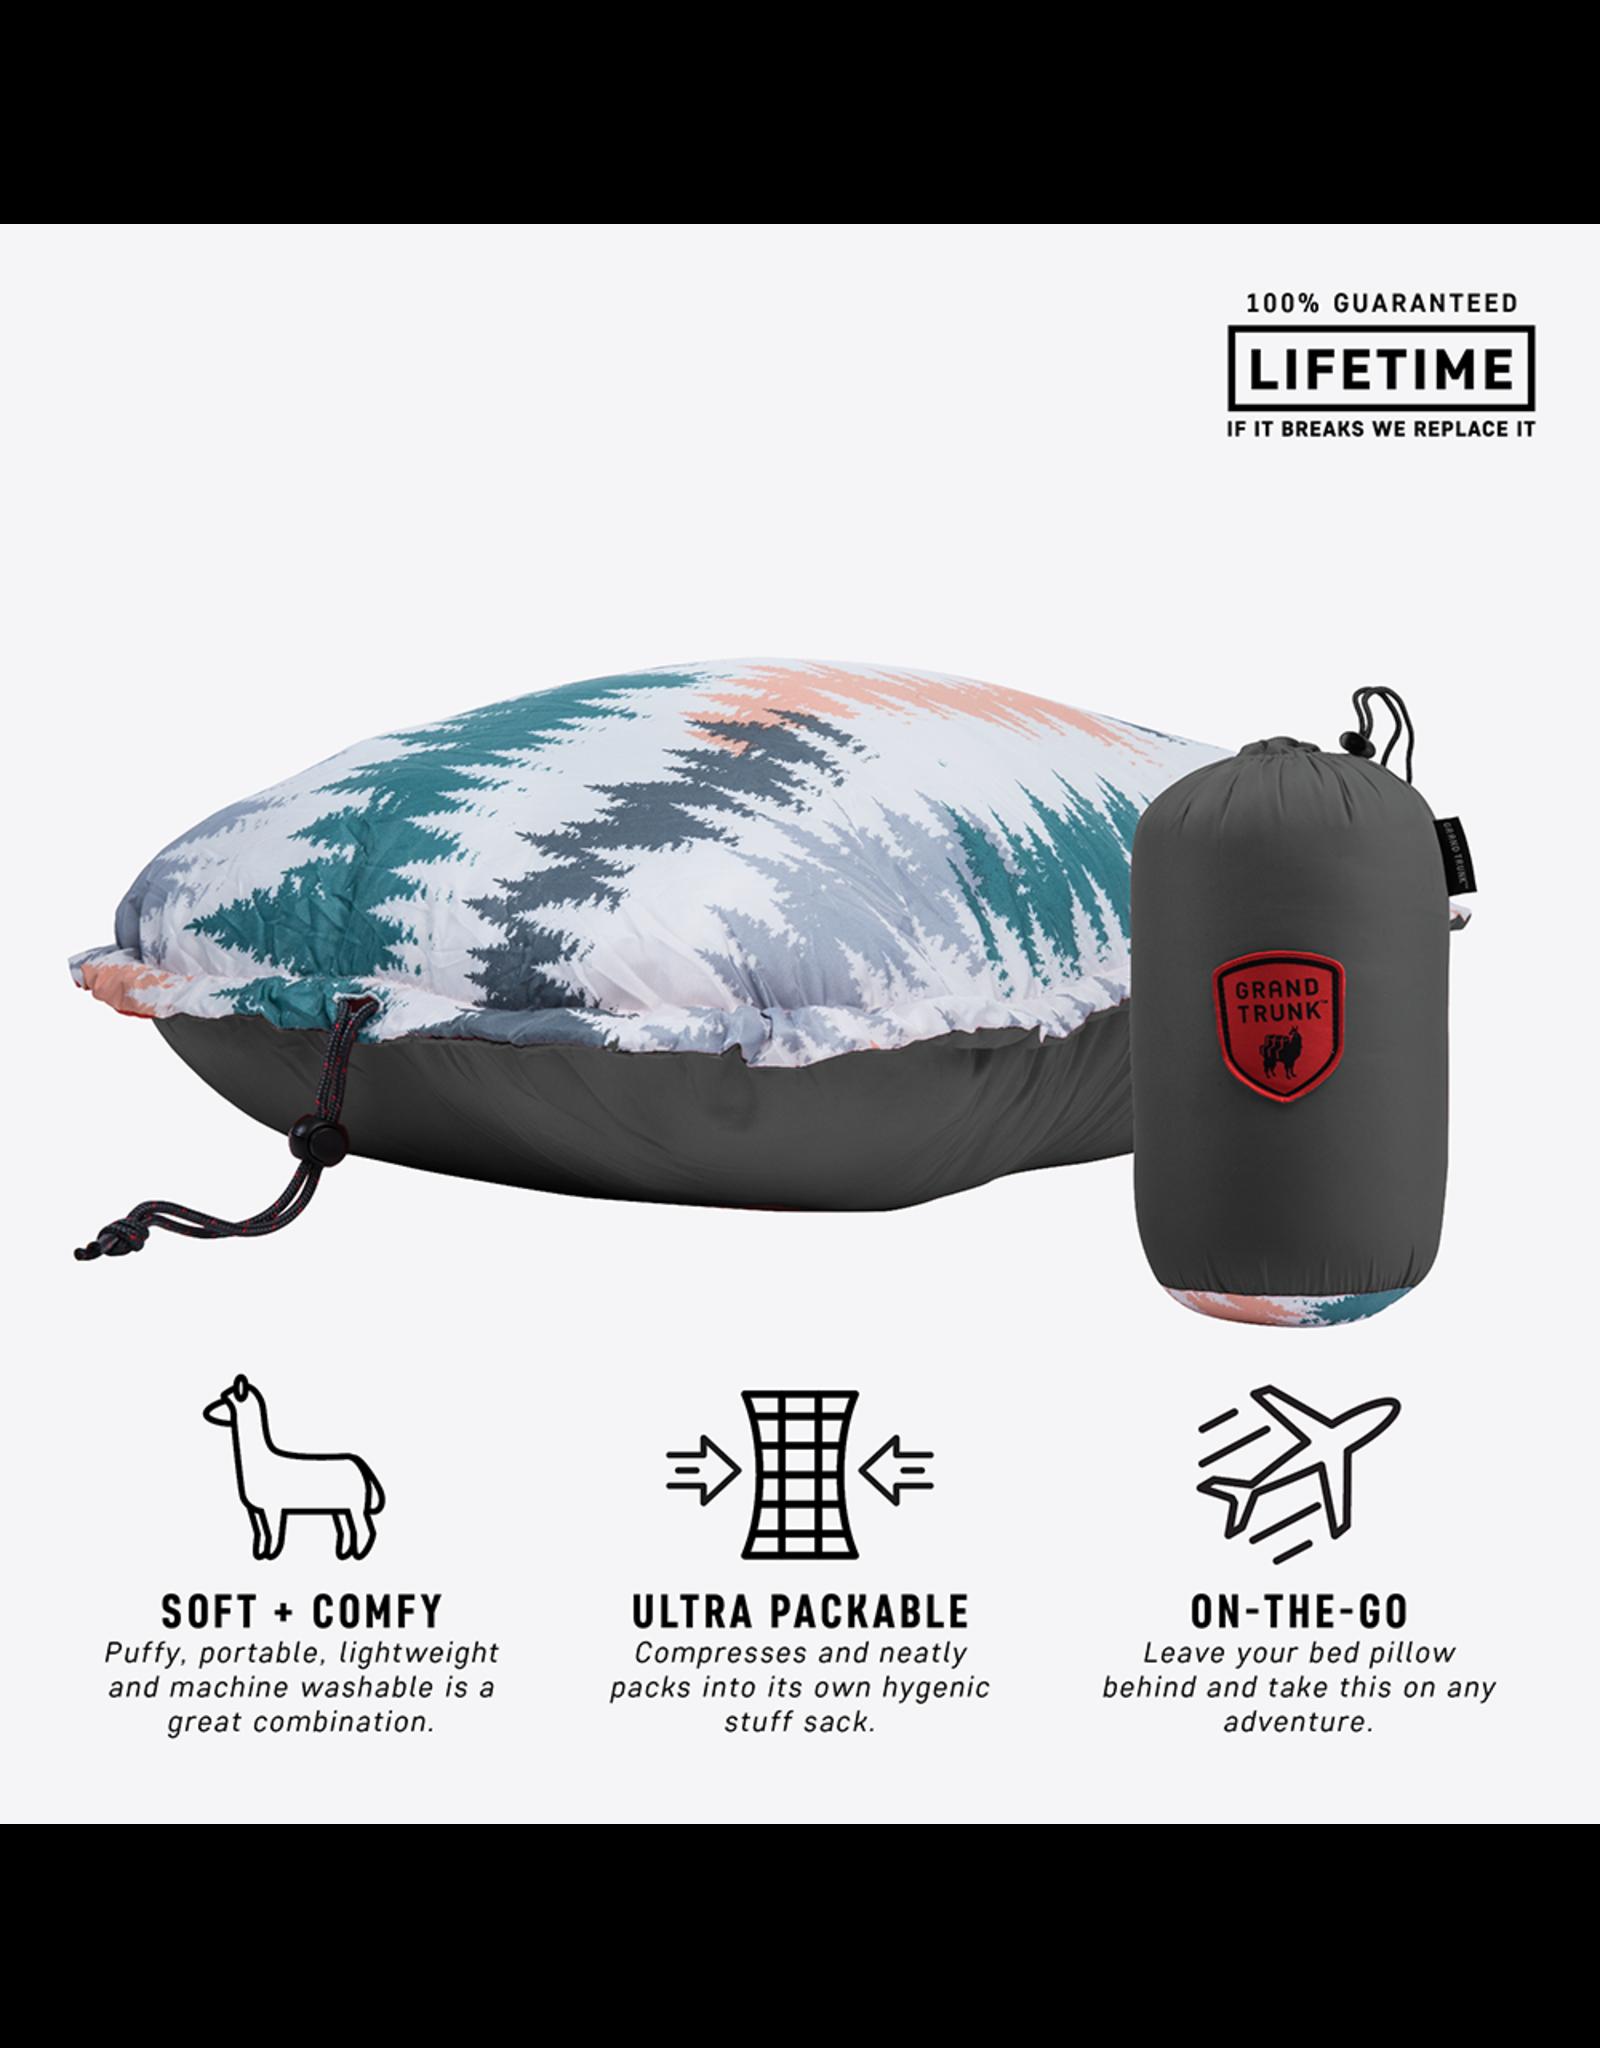 Grand Trunk GrandTrunk Puffy Travel Pillow